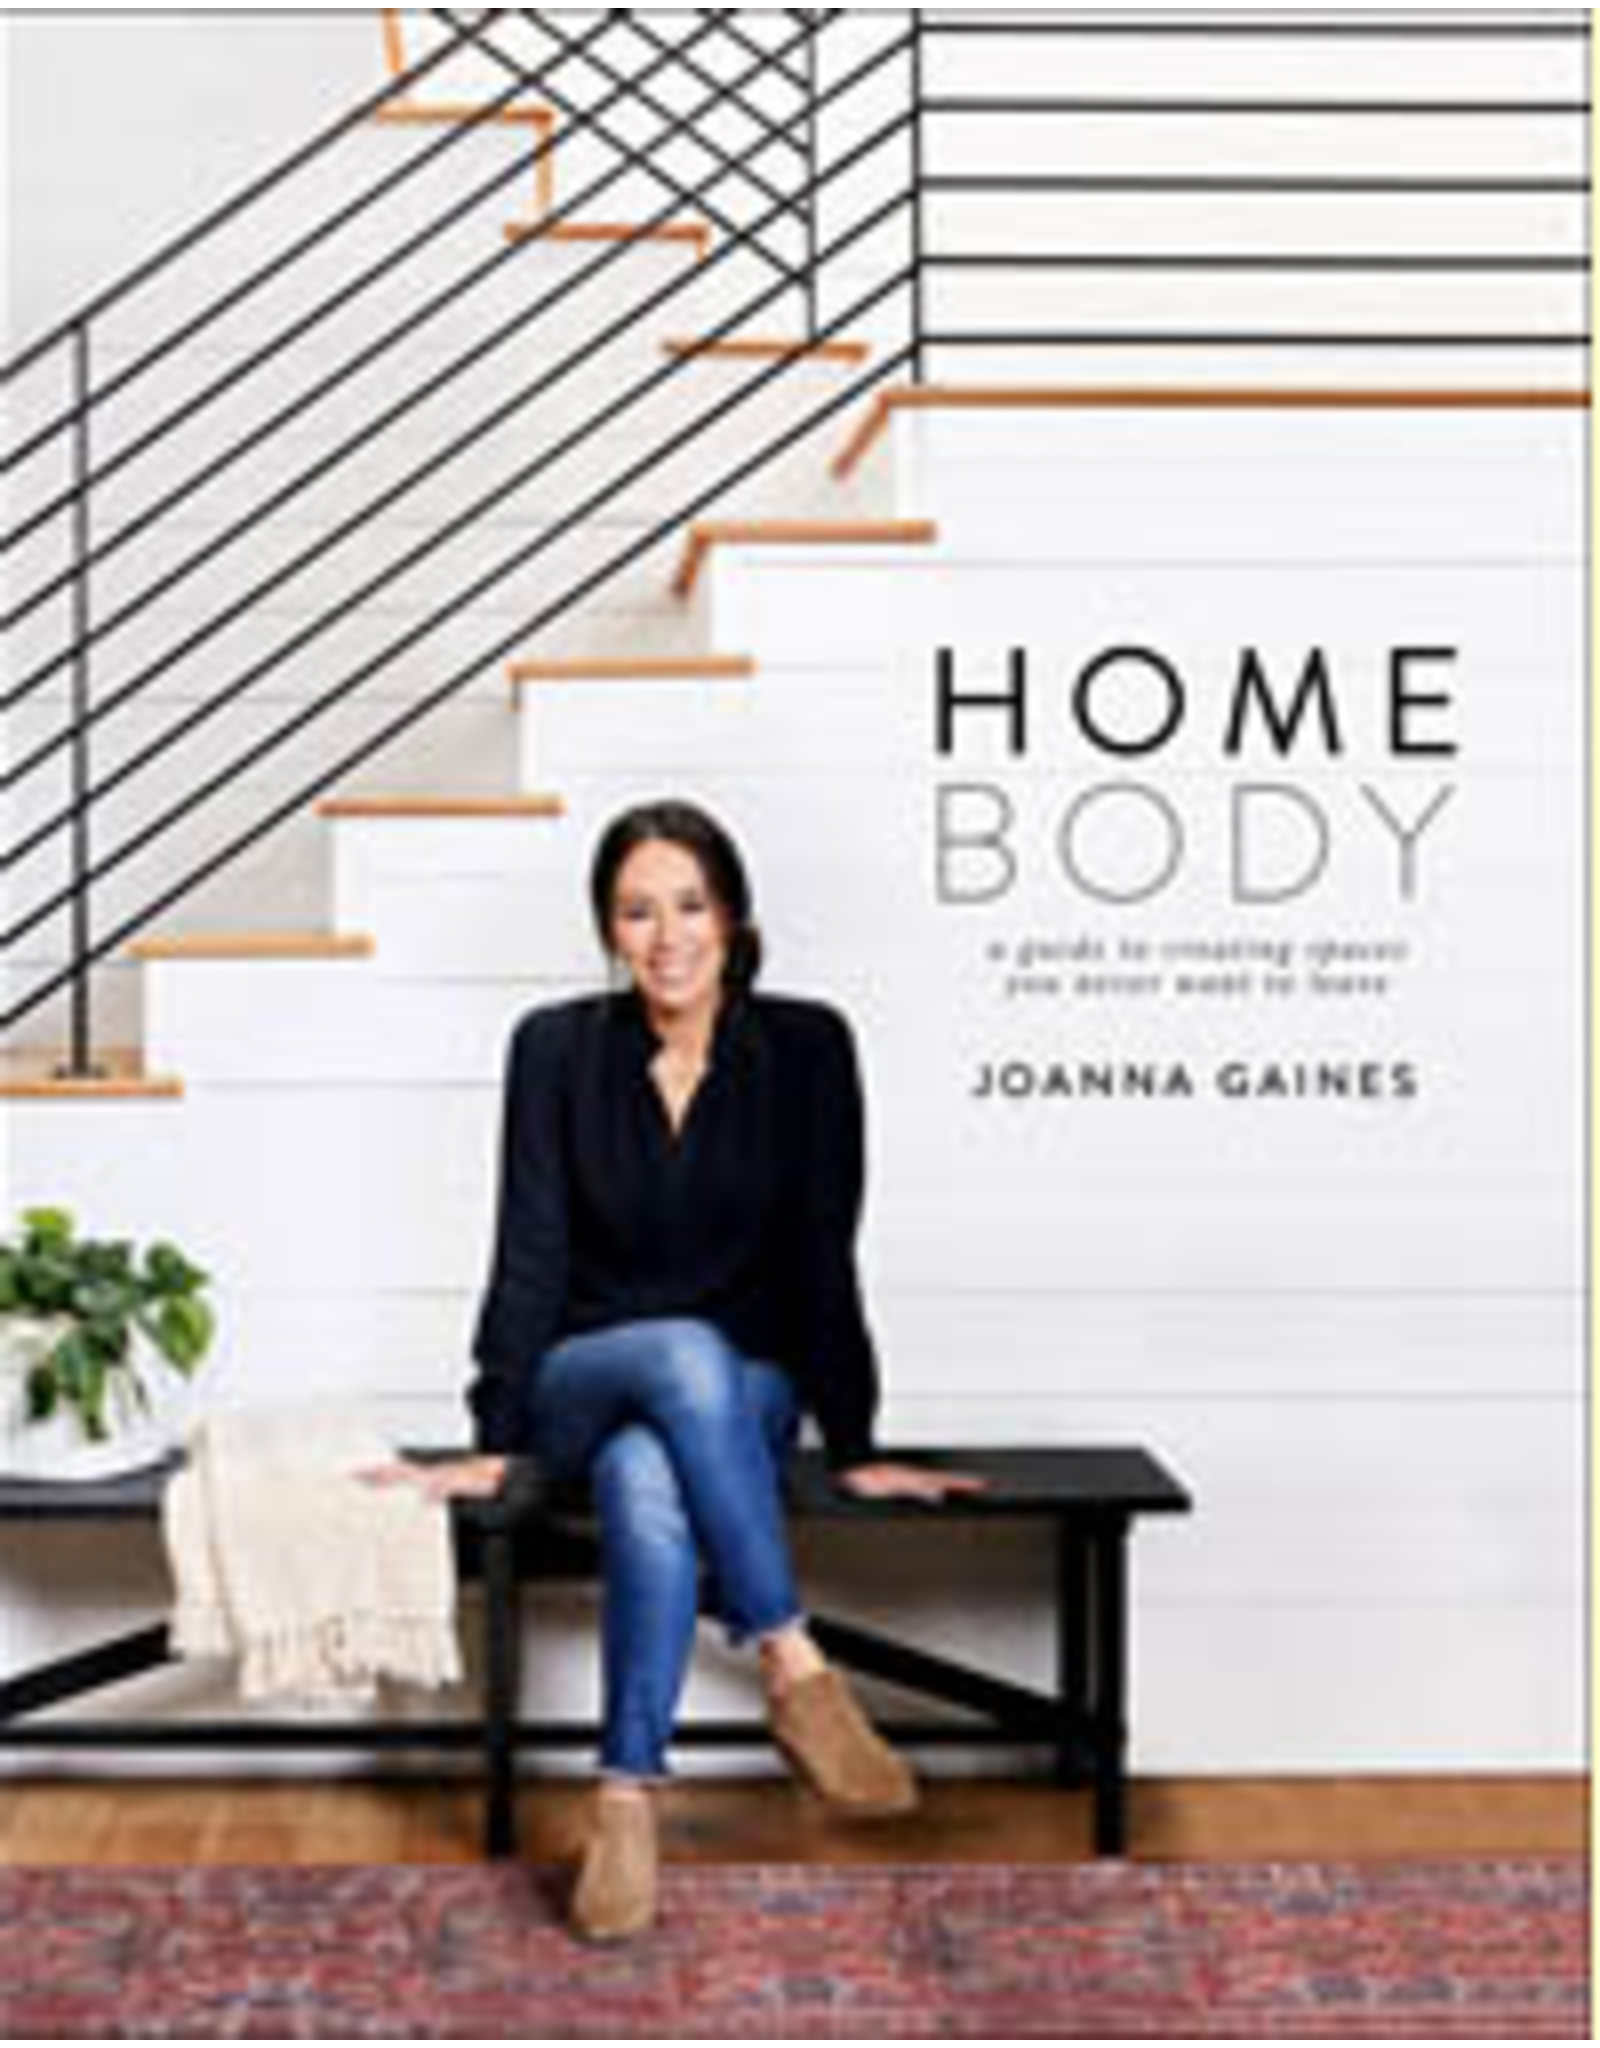 Website Homebody Joanna Gaines